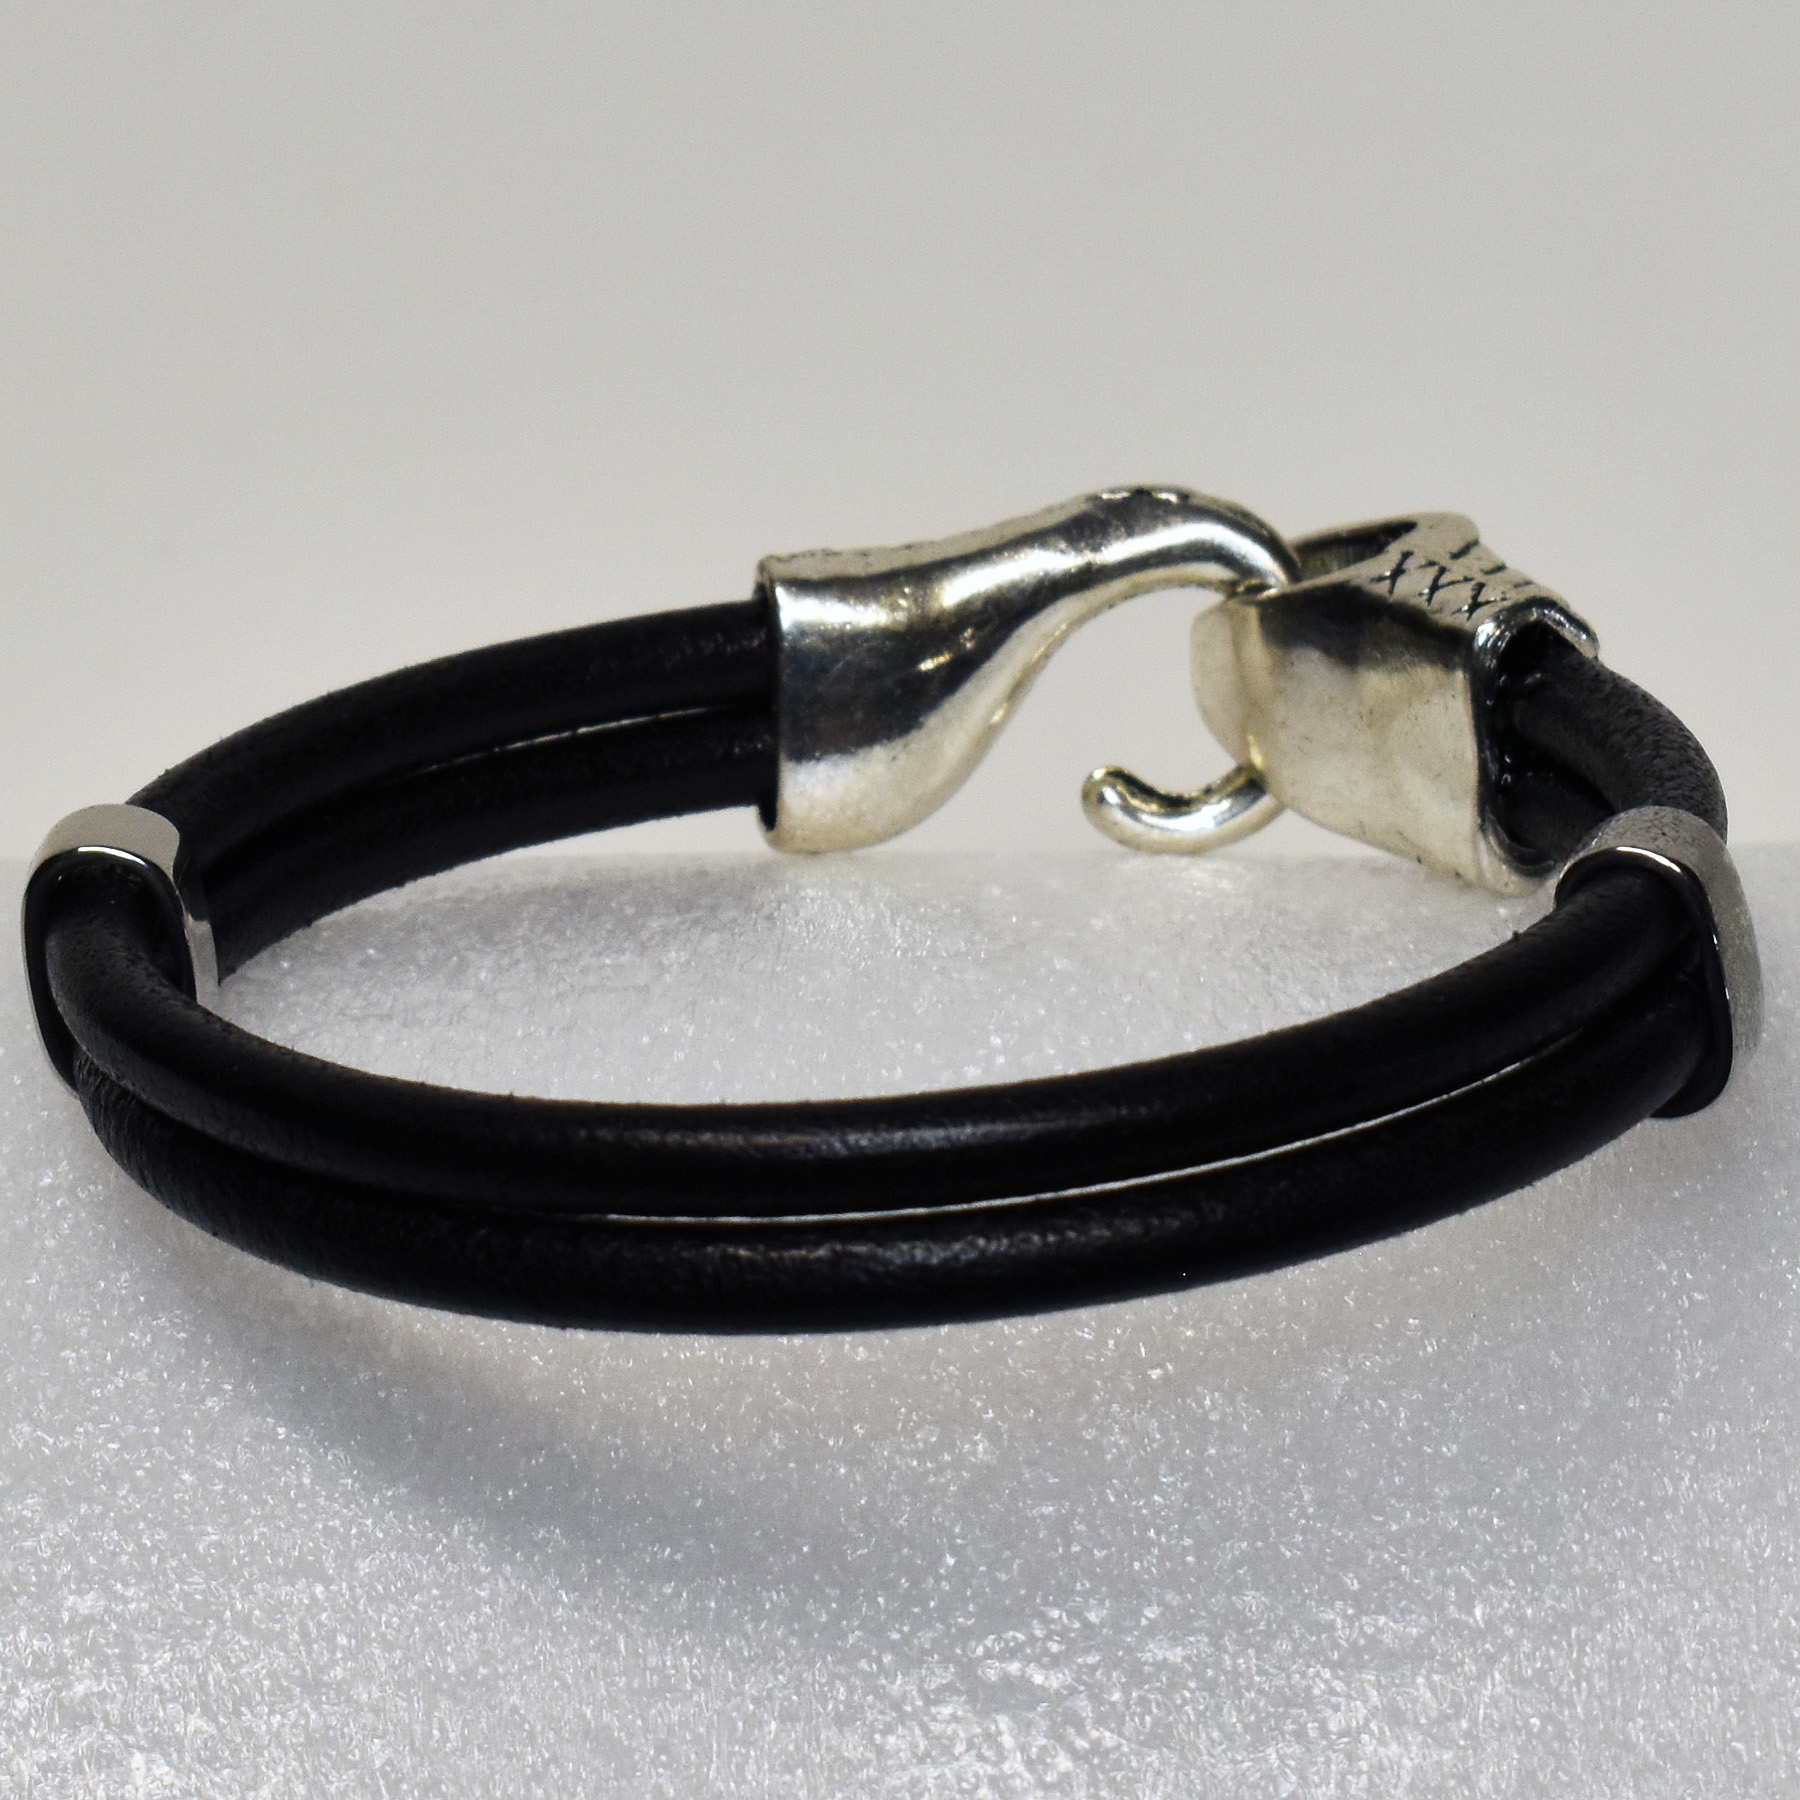 JekylsHydes_Bracelets__0013_002B